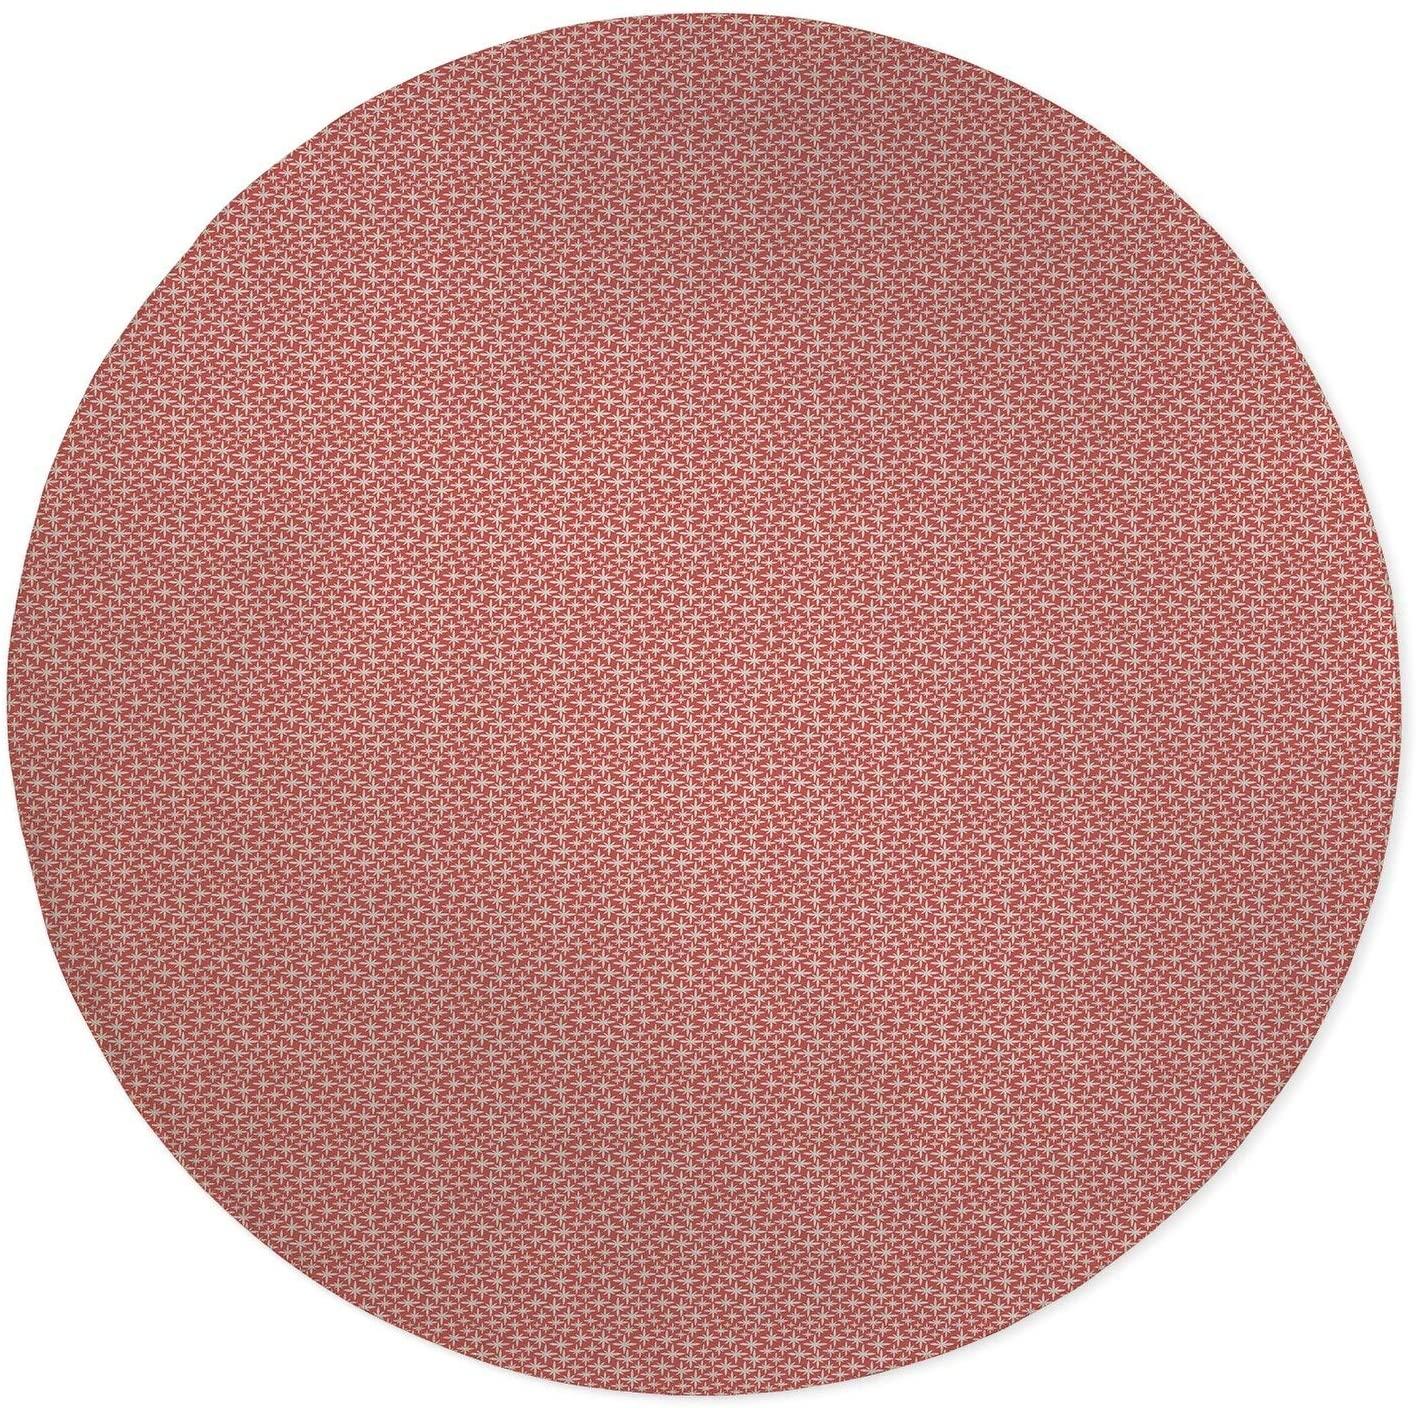 Floral Emblems Coral Office Mat Lemon Pink Modern Contemporary Synthetic Fiber